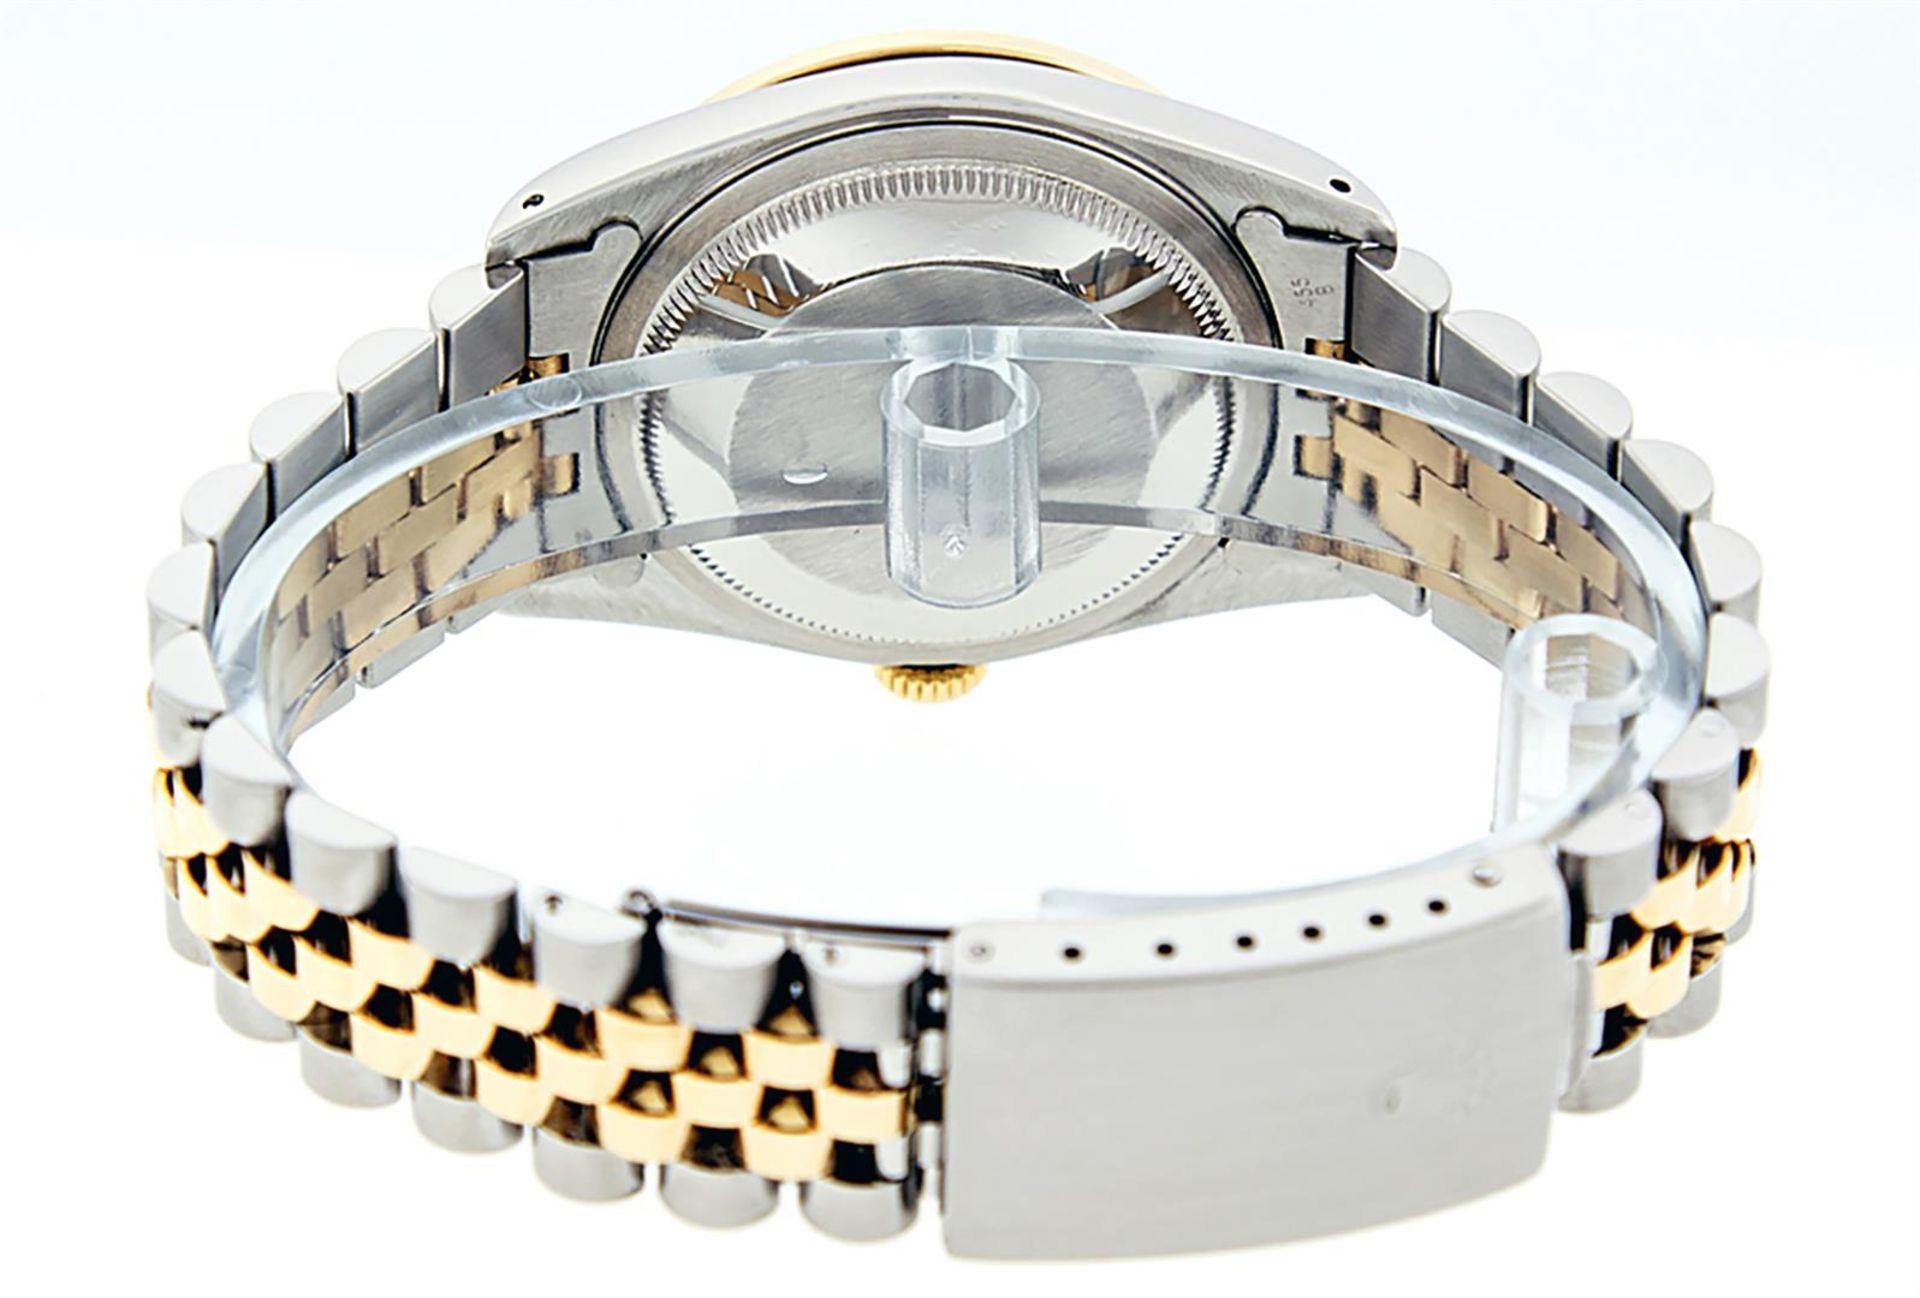 Rolex Mens 2 Tone Blue Vignette Diamond & Sapphire Datejust Wristwatch - Image 9 of 9